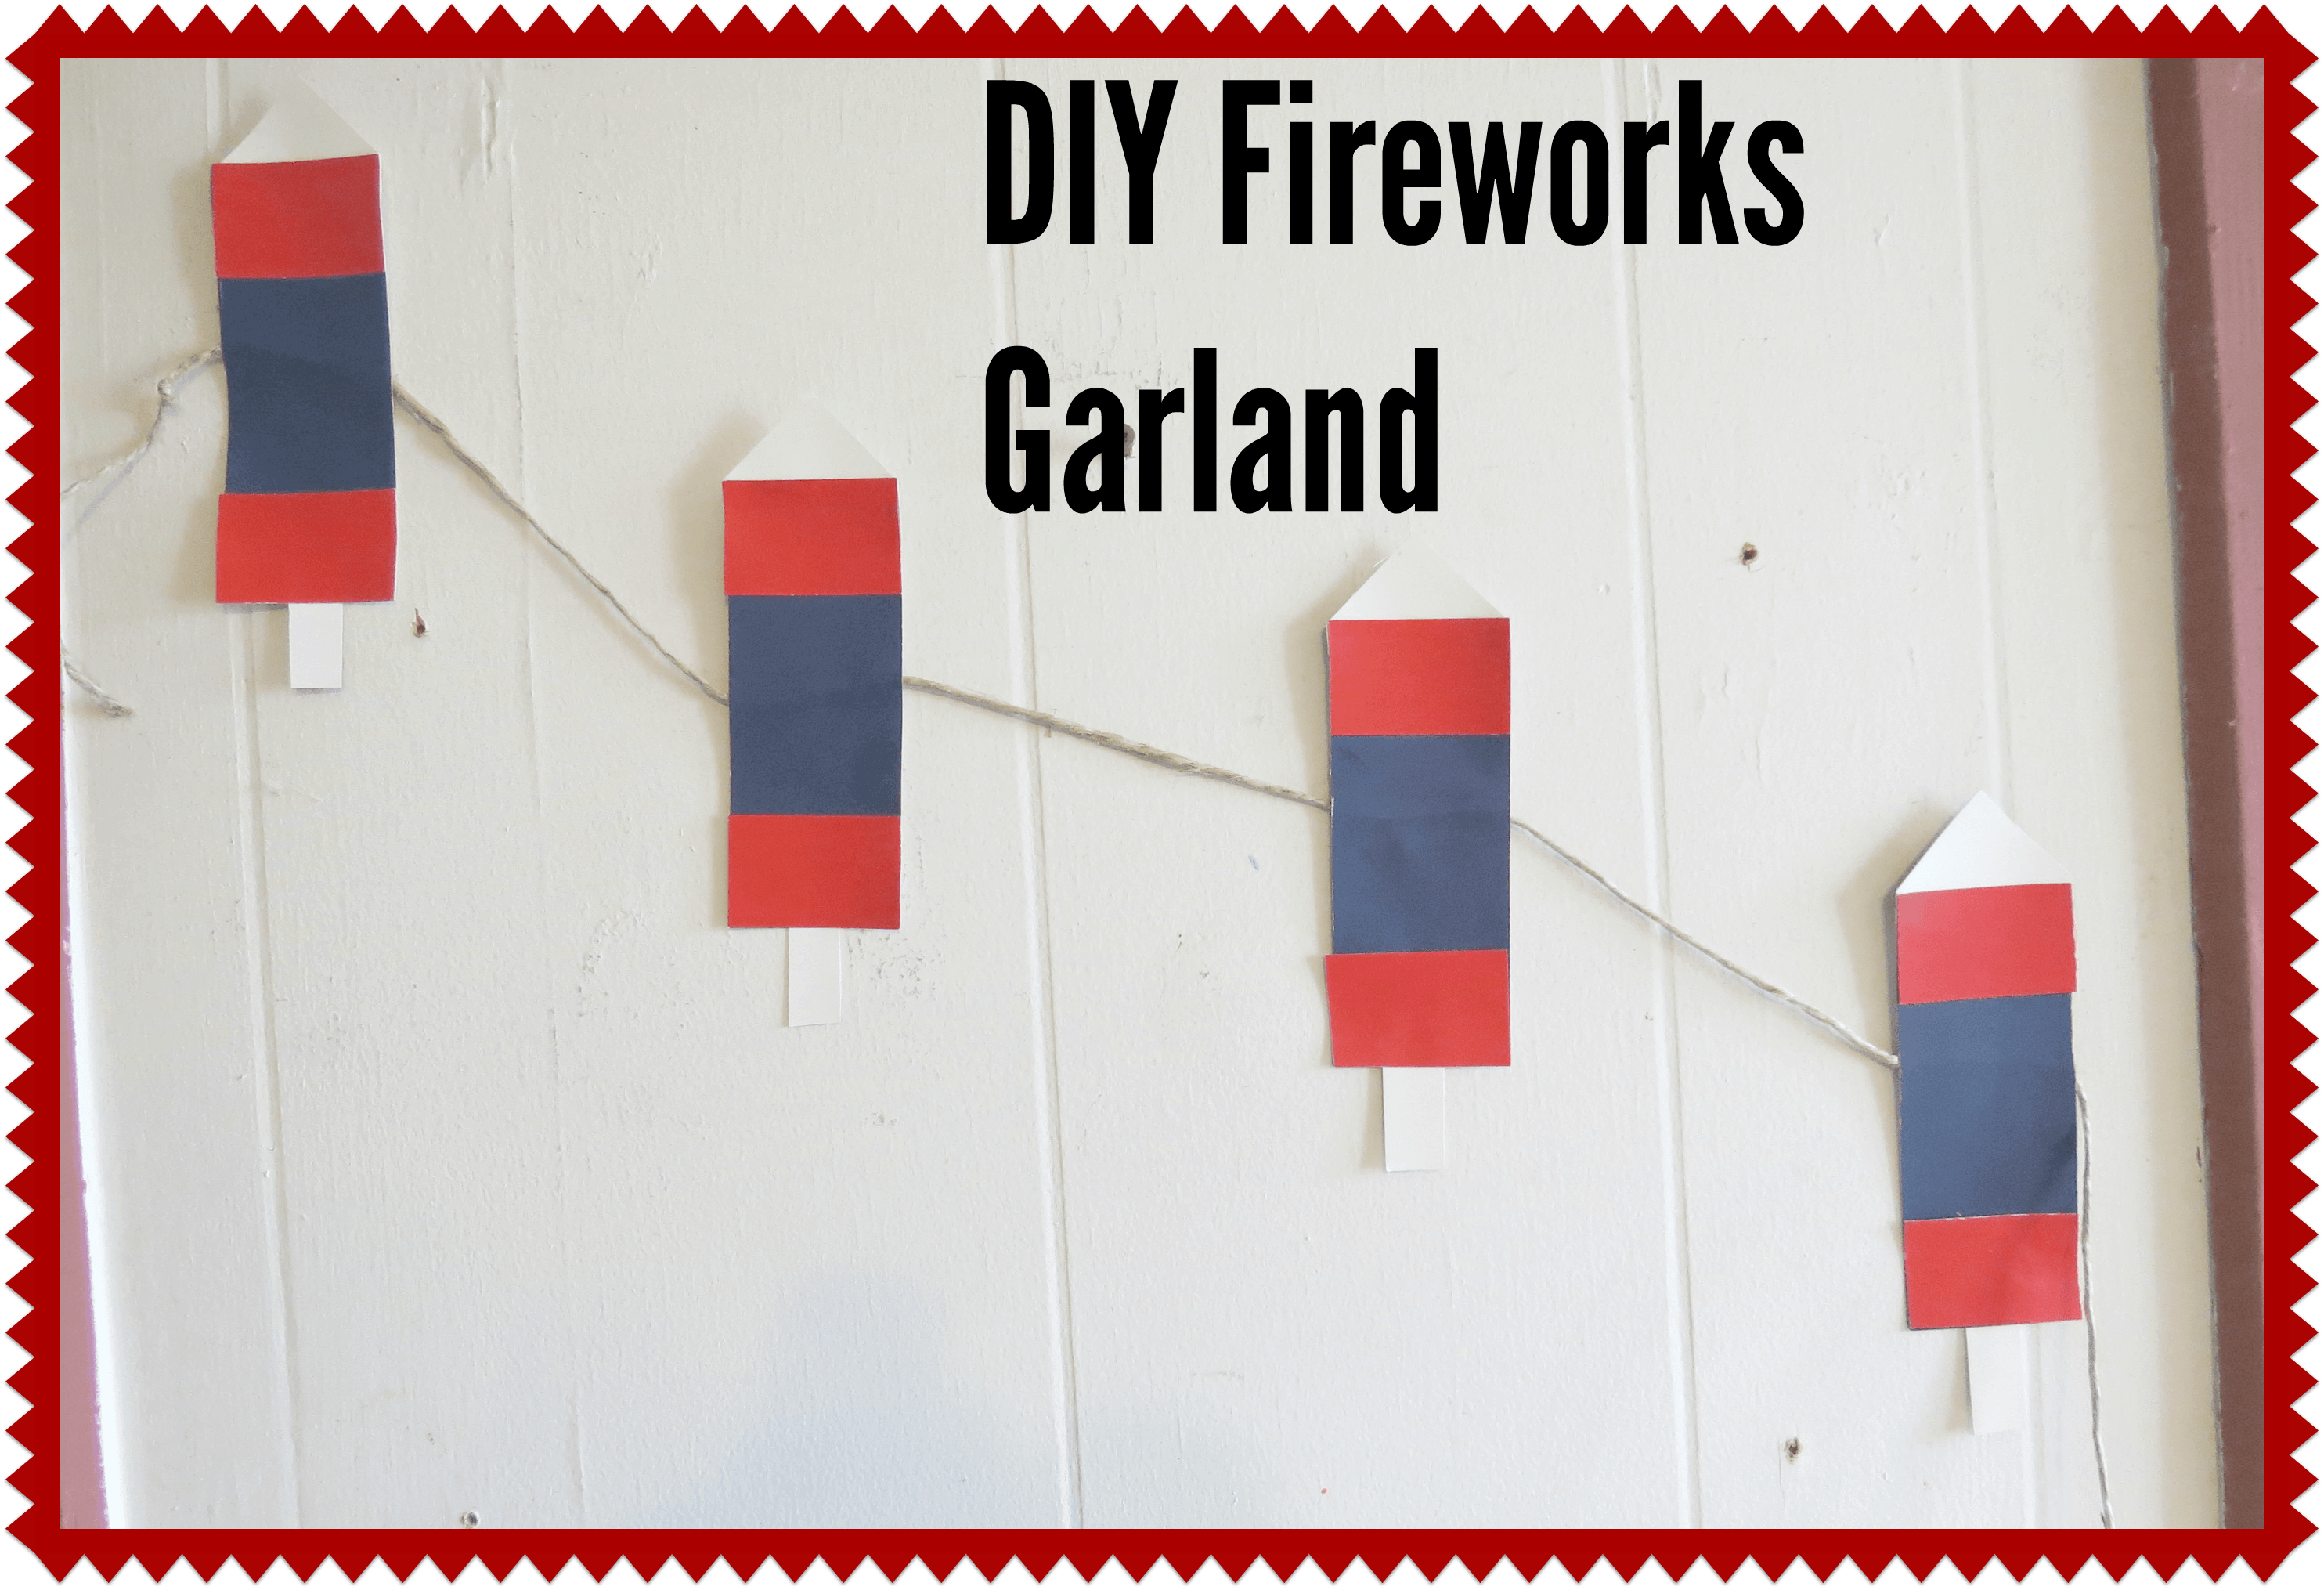 DIY Fireworks Garland